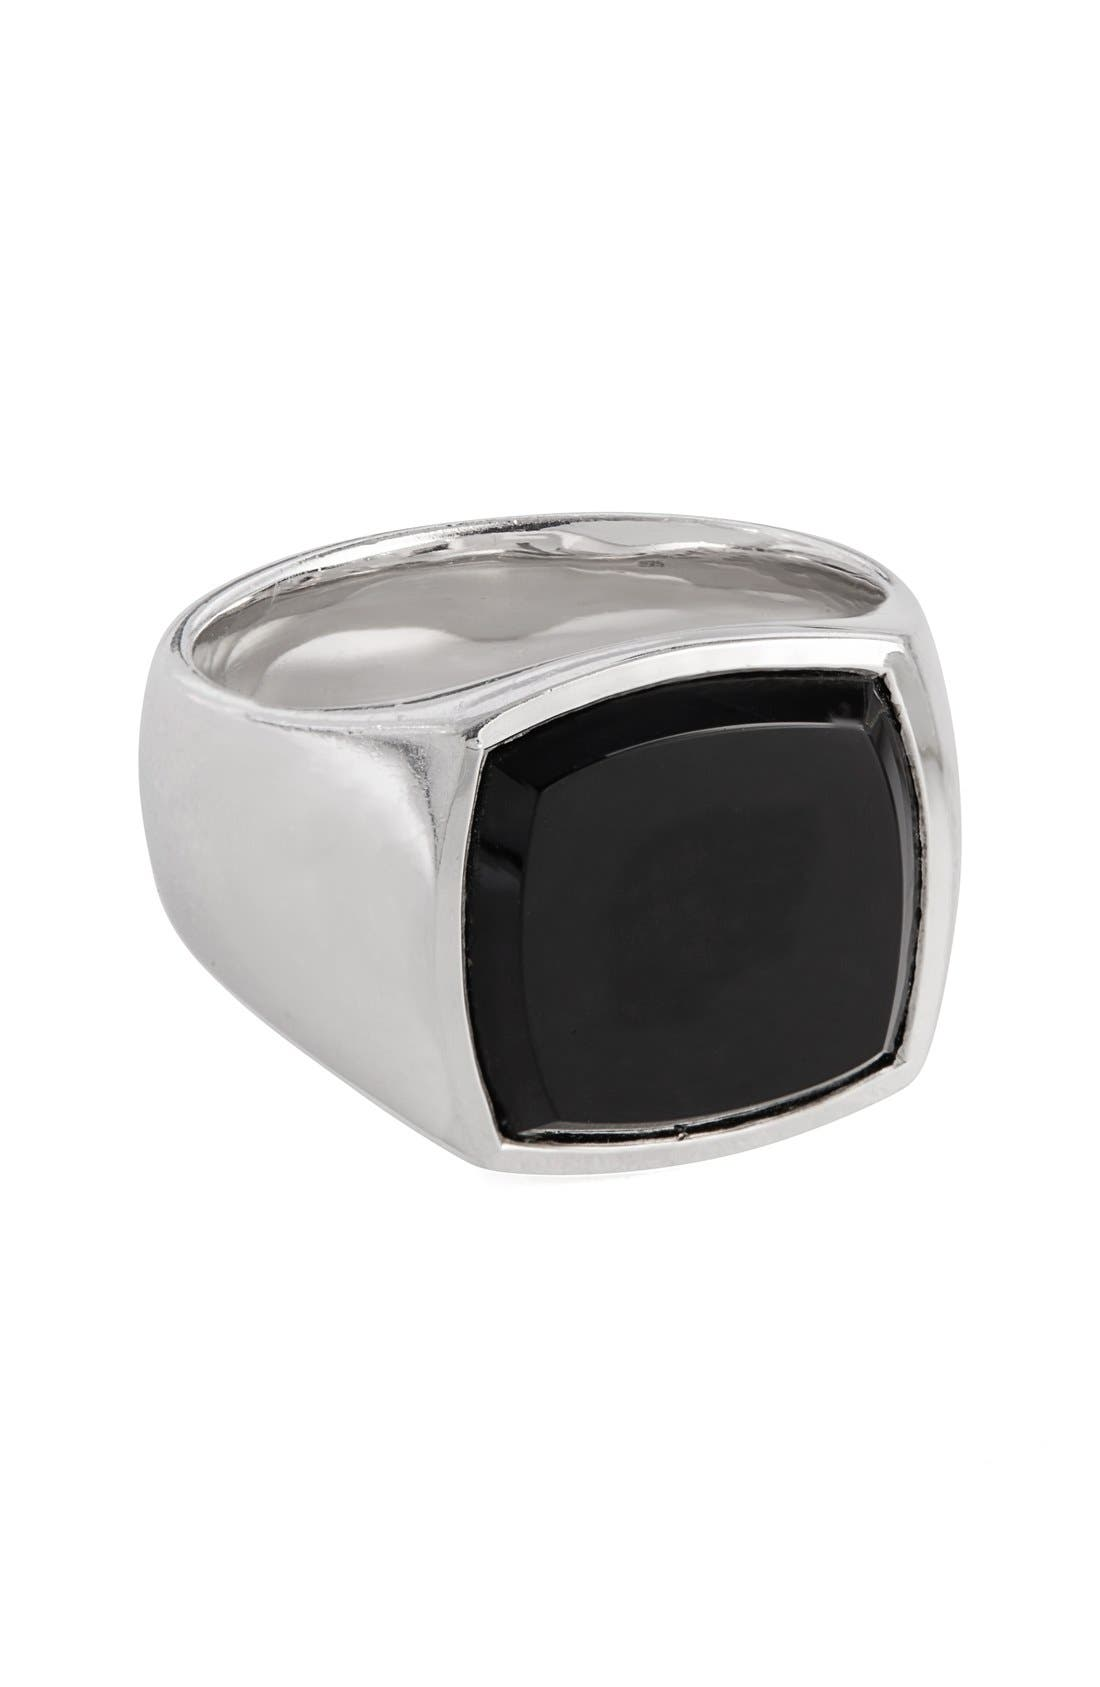 Tom Wood Black Onyx Cushion Signet Ring